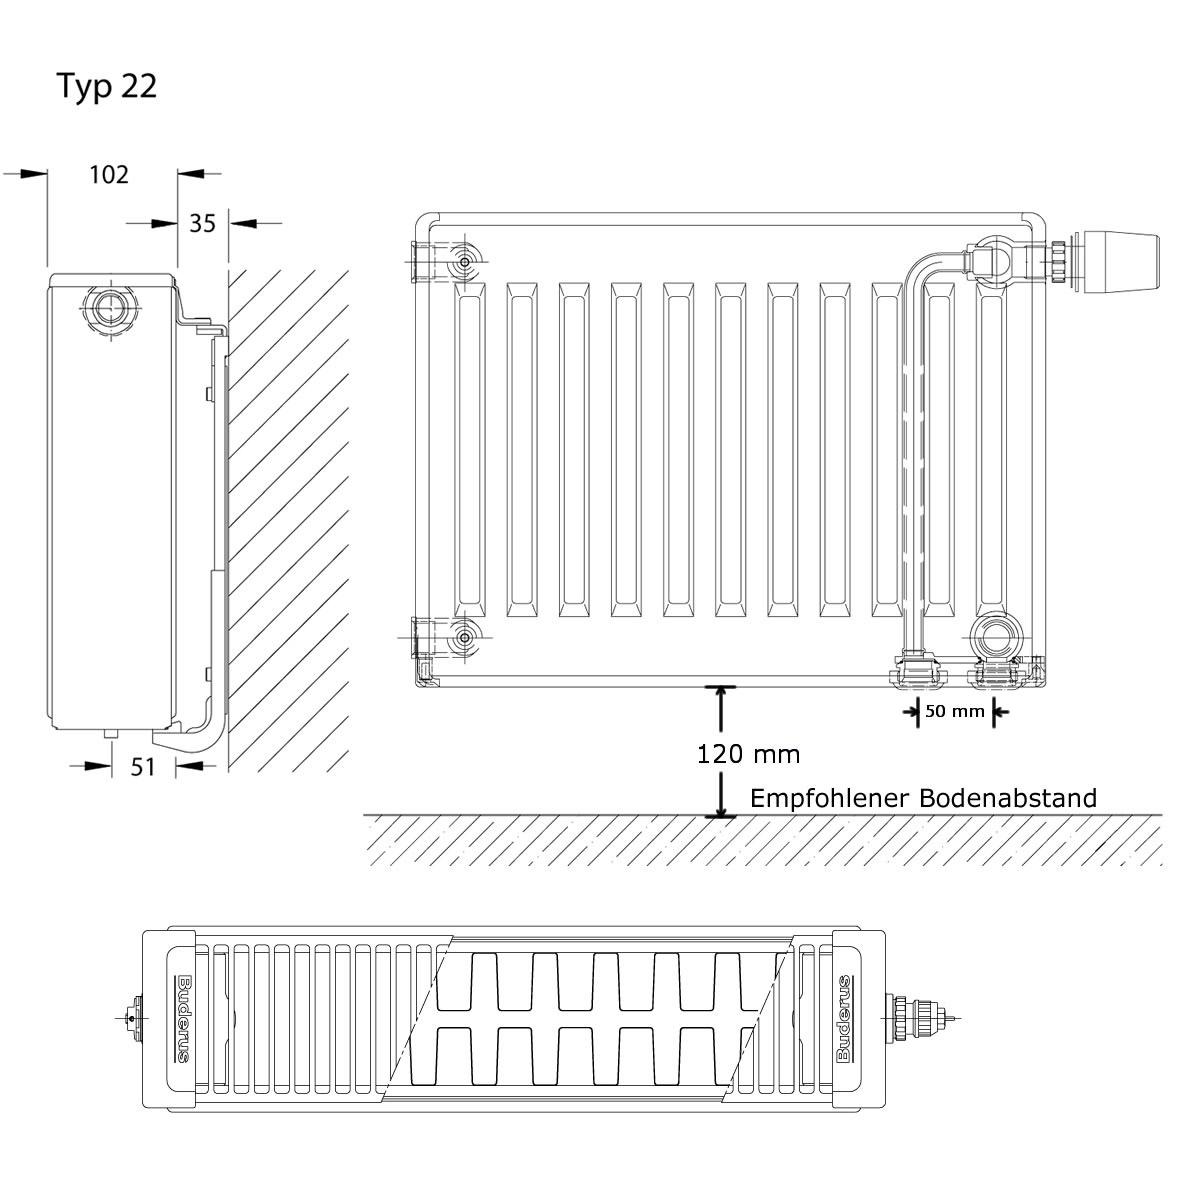 buderus logatrend vc profil ventil heizk rper h 300 mm l 1600 mm typ 22 1267 807 watt heizung. Black Bedroom Furniture Sets. Home Design Ideas